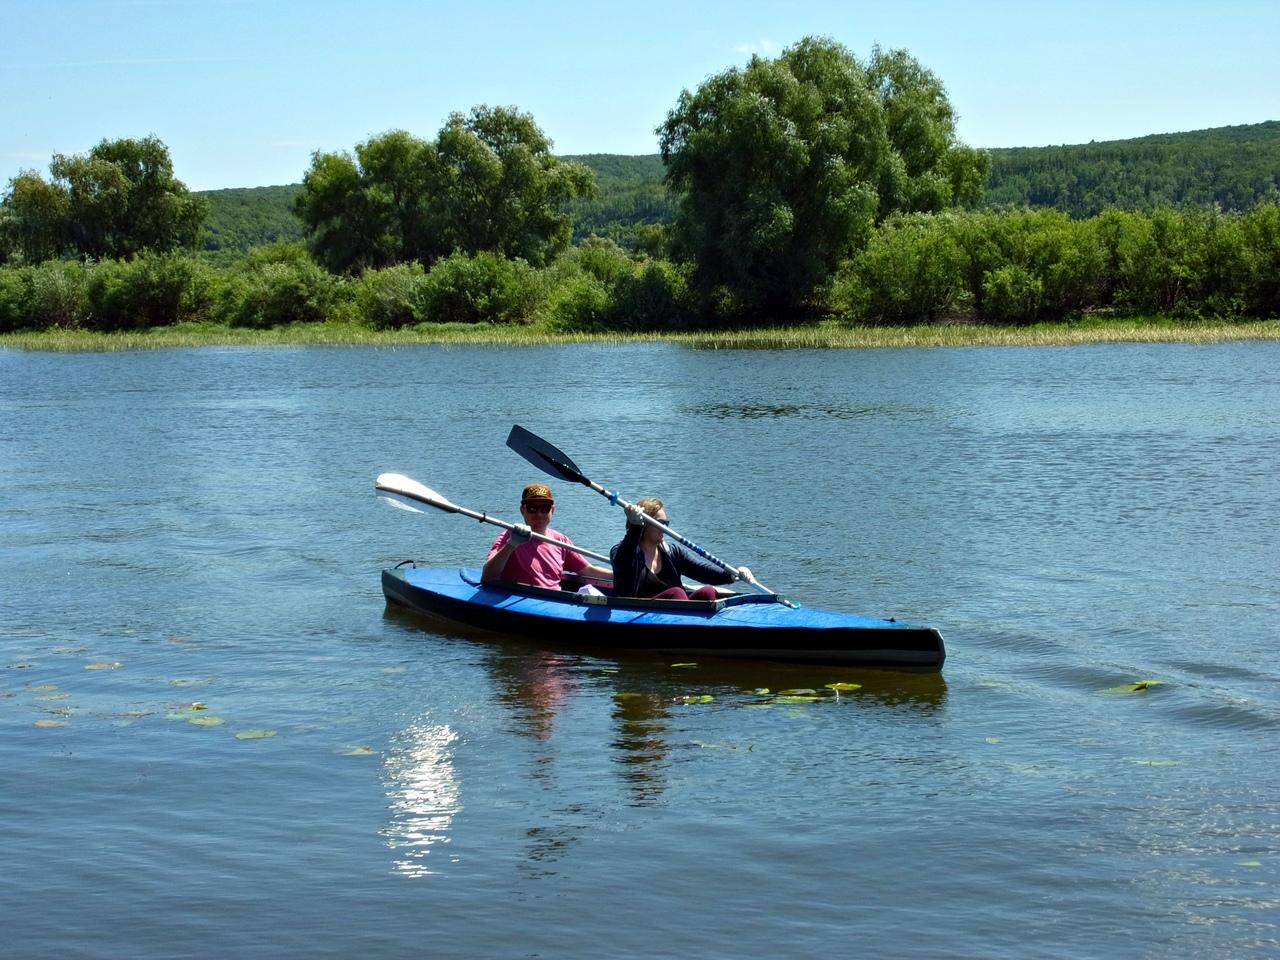 Афиша Самара Сплав на байдарках по реке Сок 12 и 27 сентября